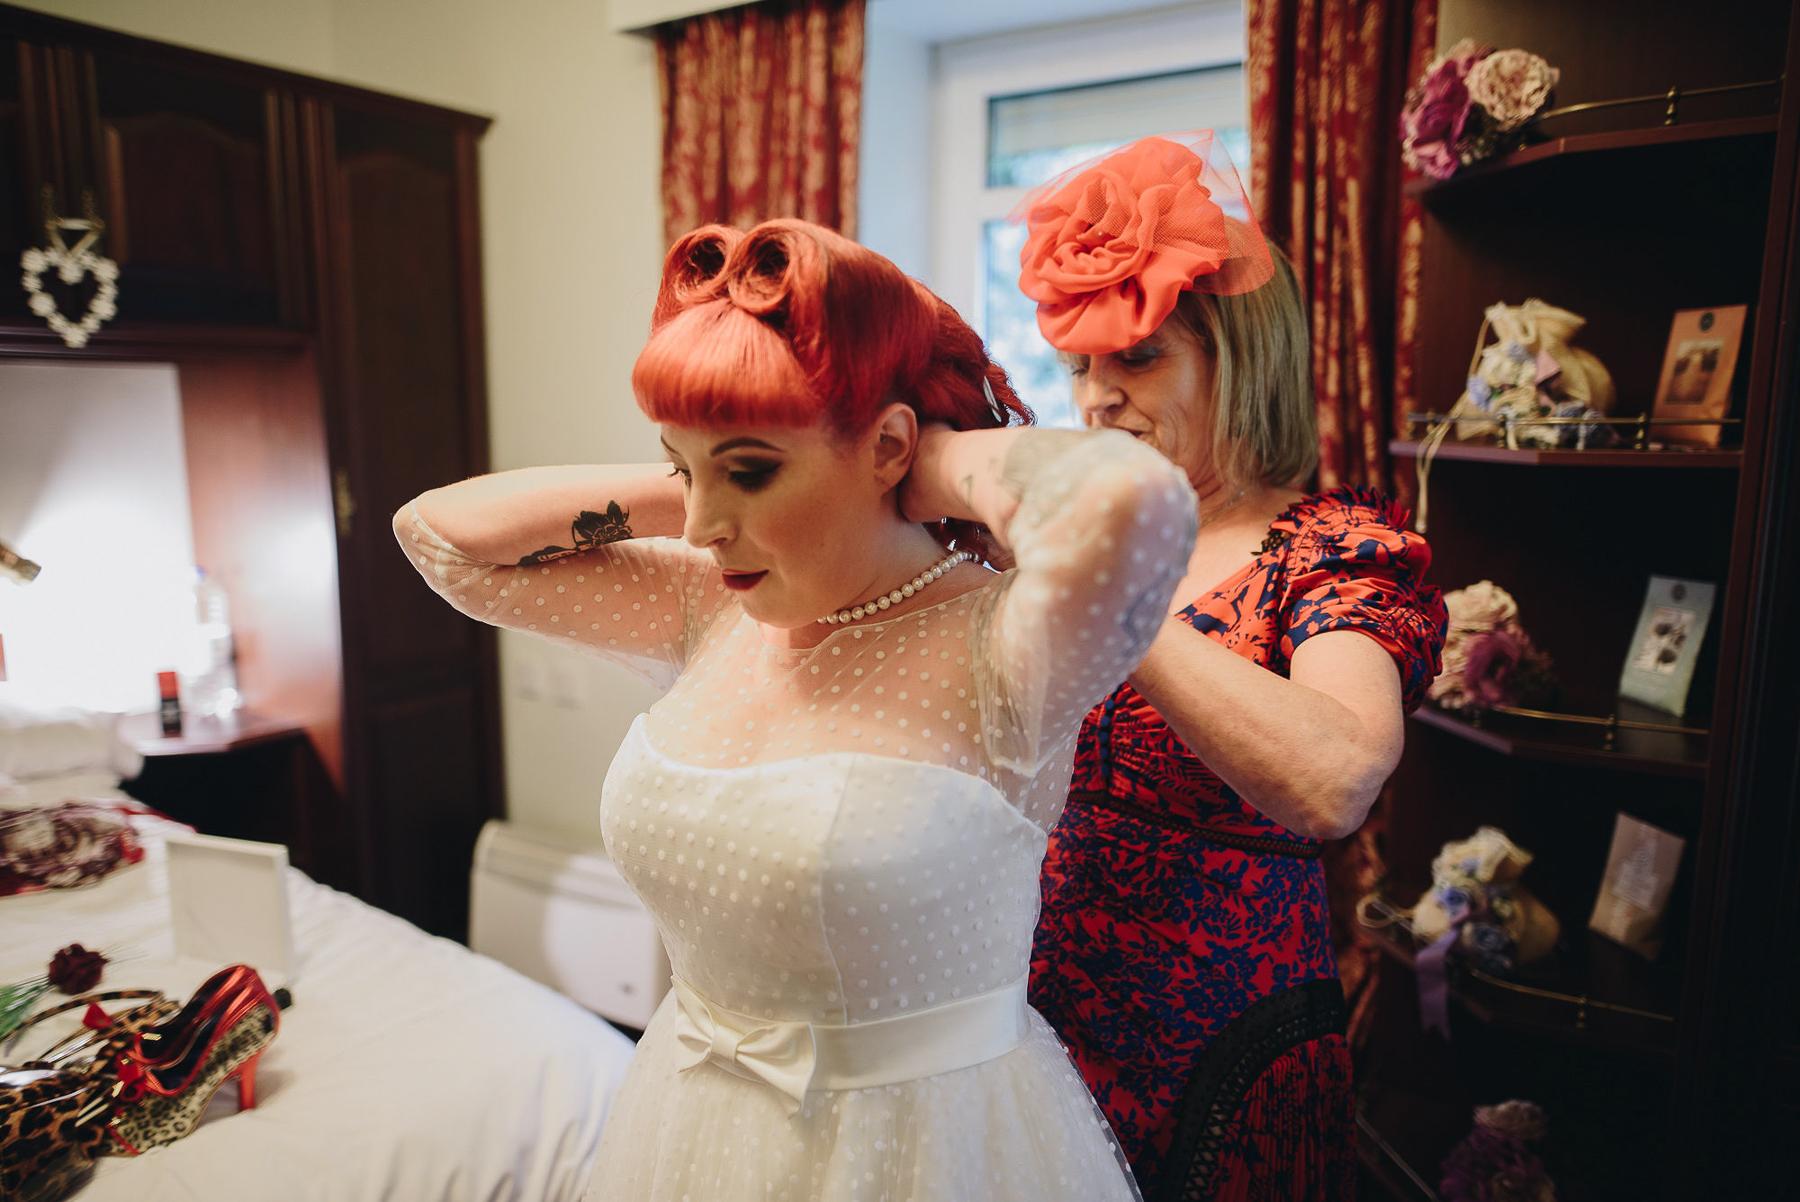 Wellbeing_Farm_Wedding_Photography_The_Pin-Up_Bride_Lara_Shaun-34.jpg